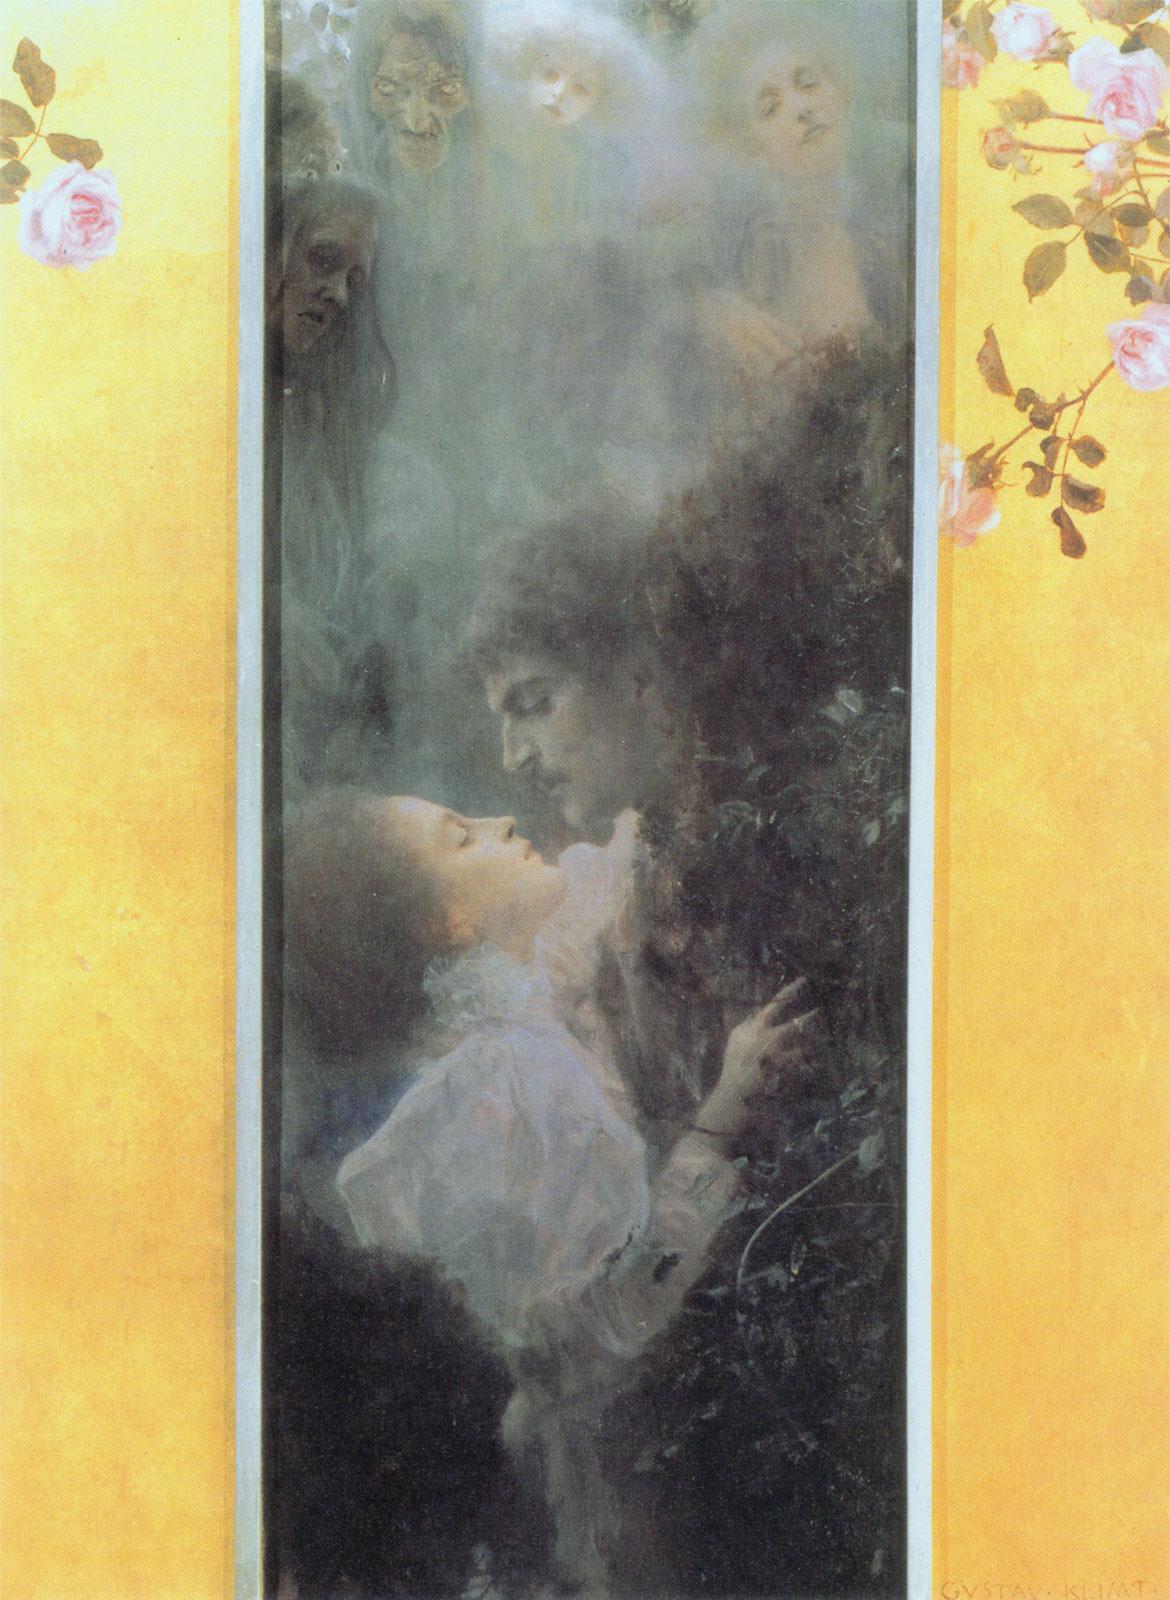 Amore (1895, Gustav Klimt)